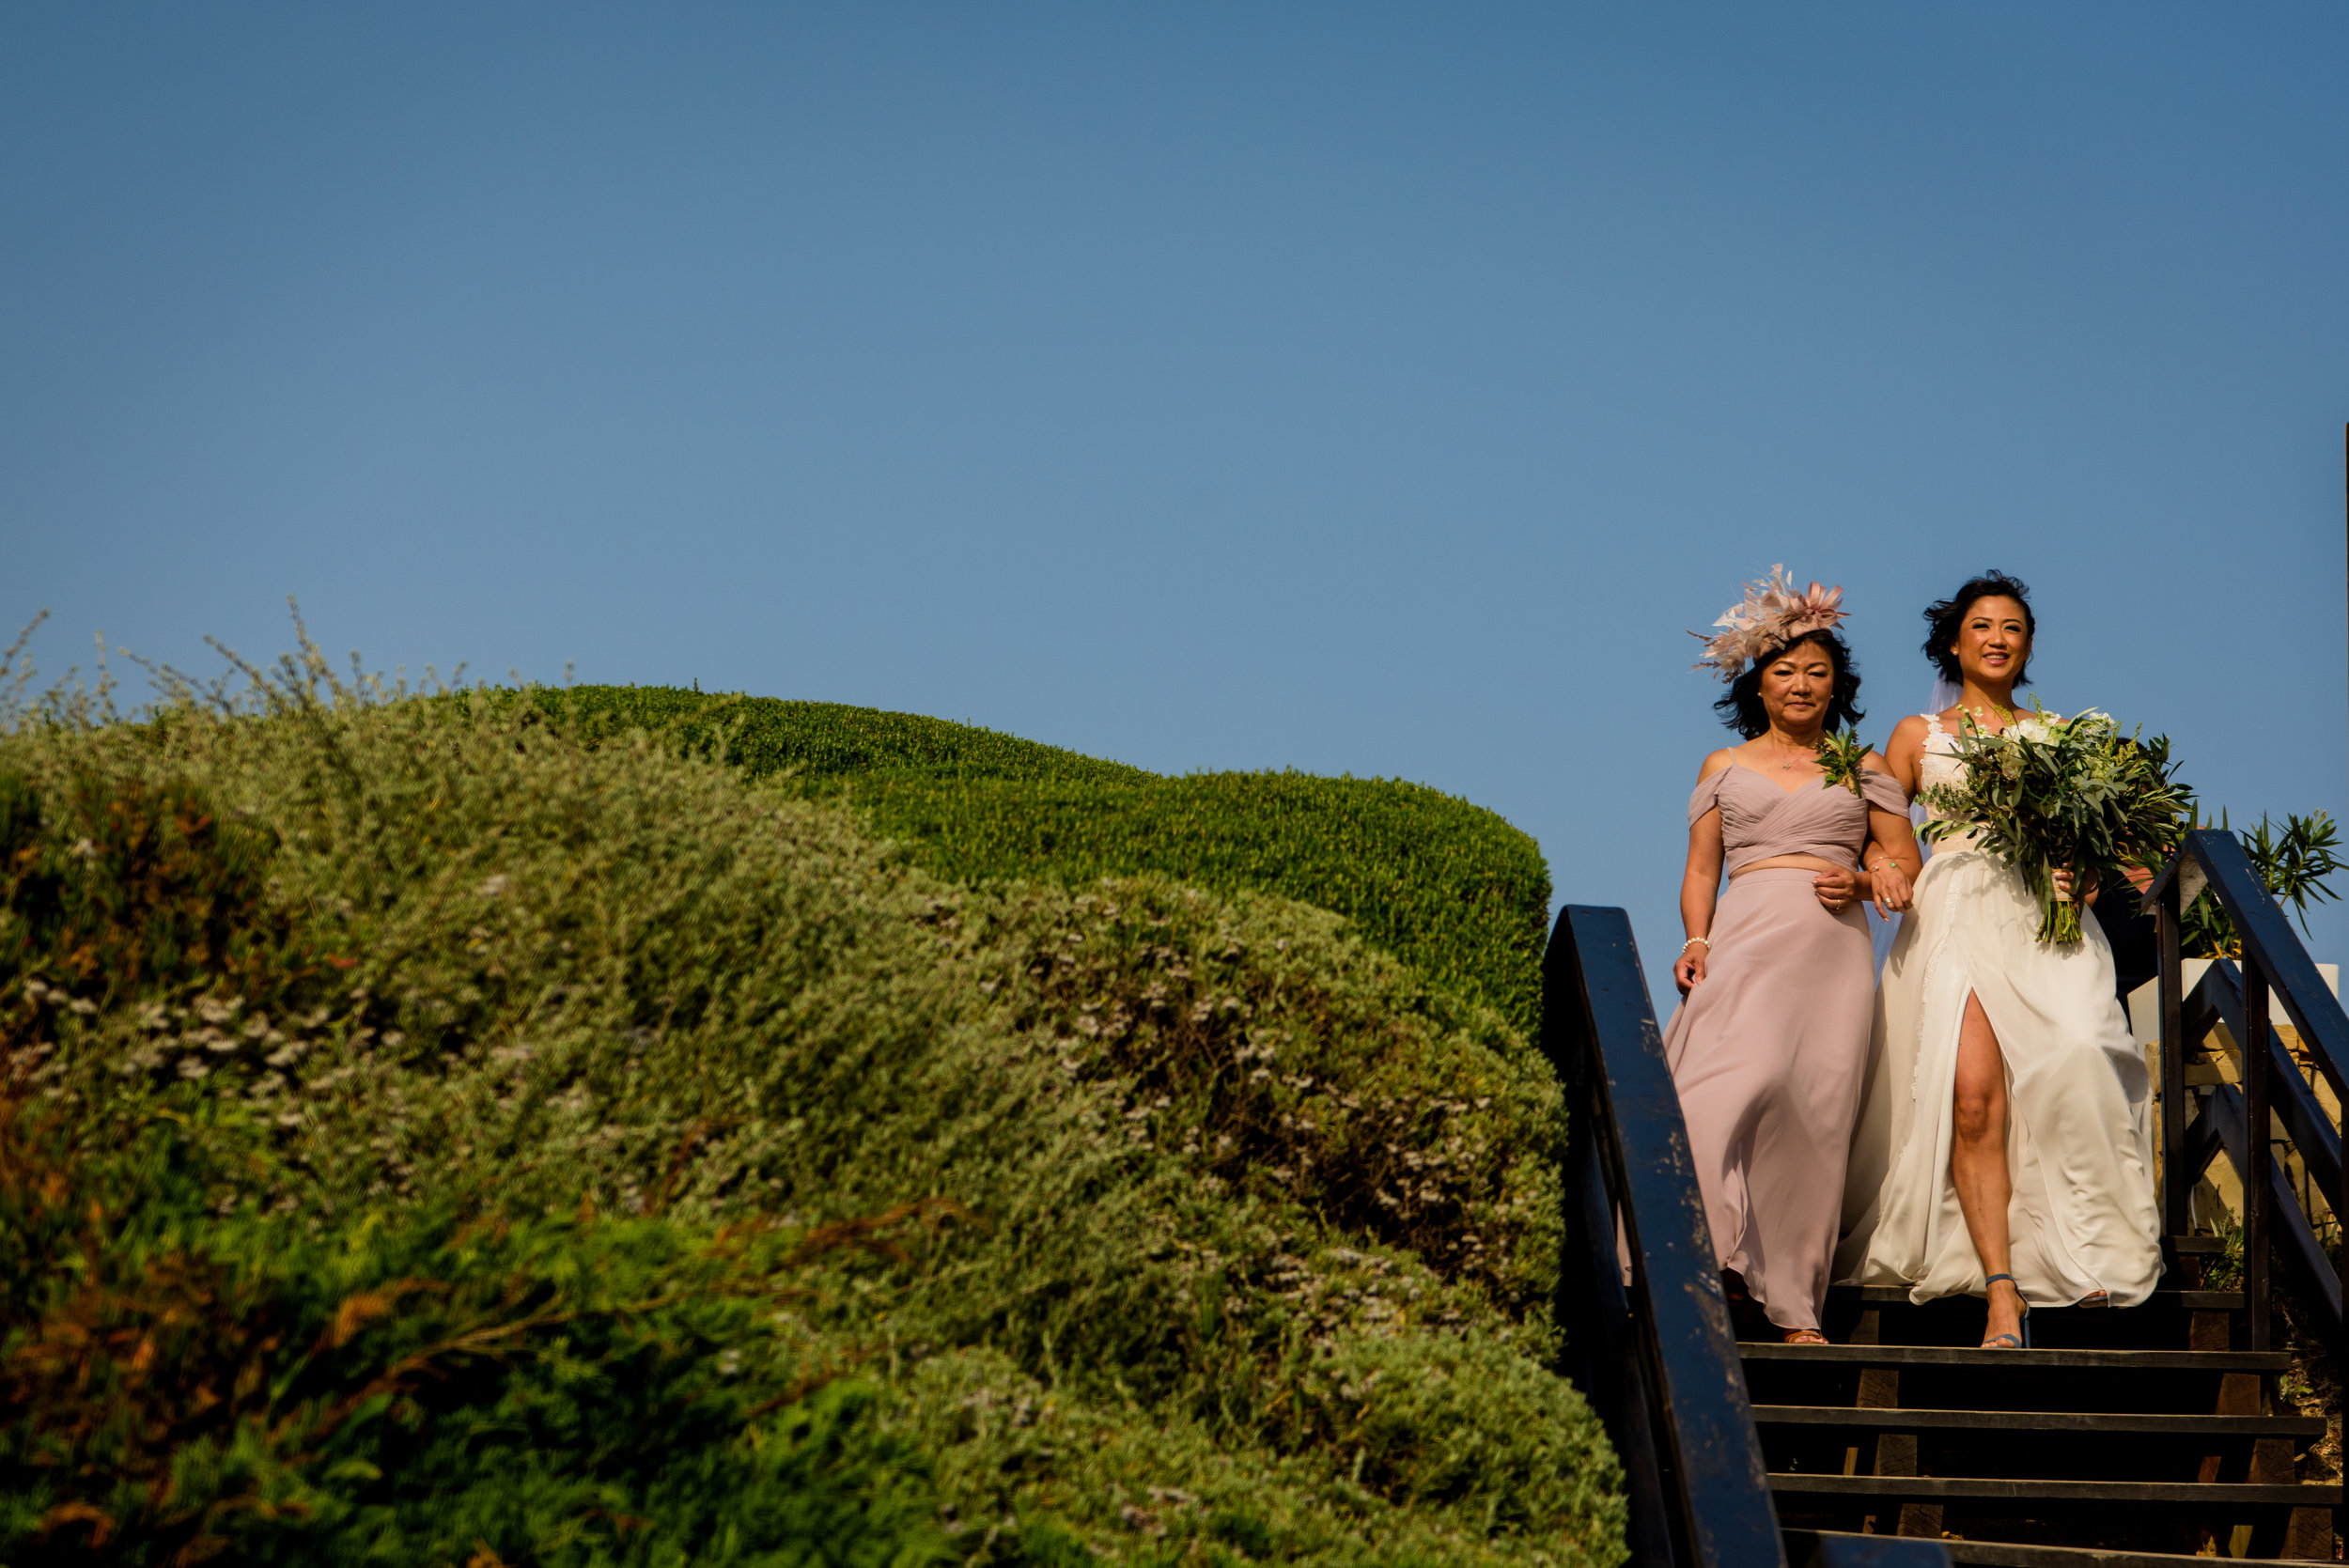 minty-frank-wedding-favorites-102.jpg